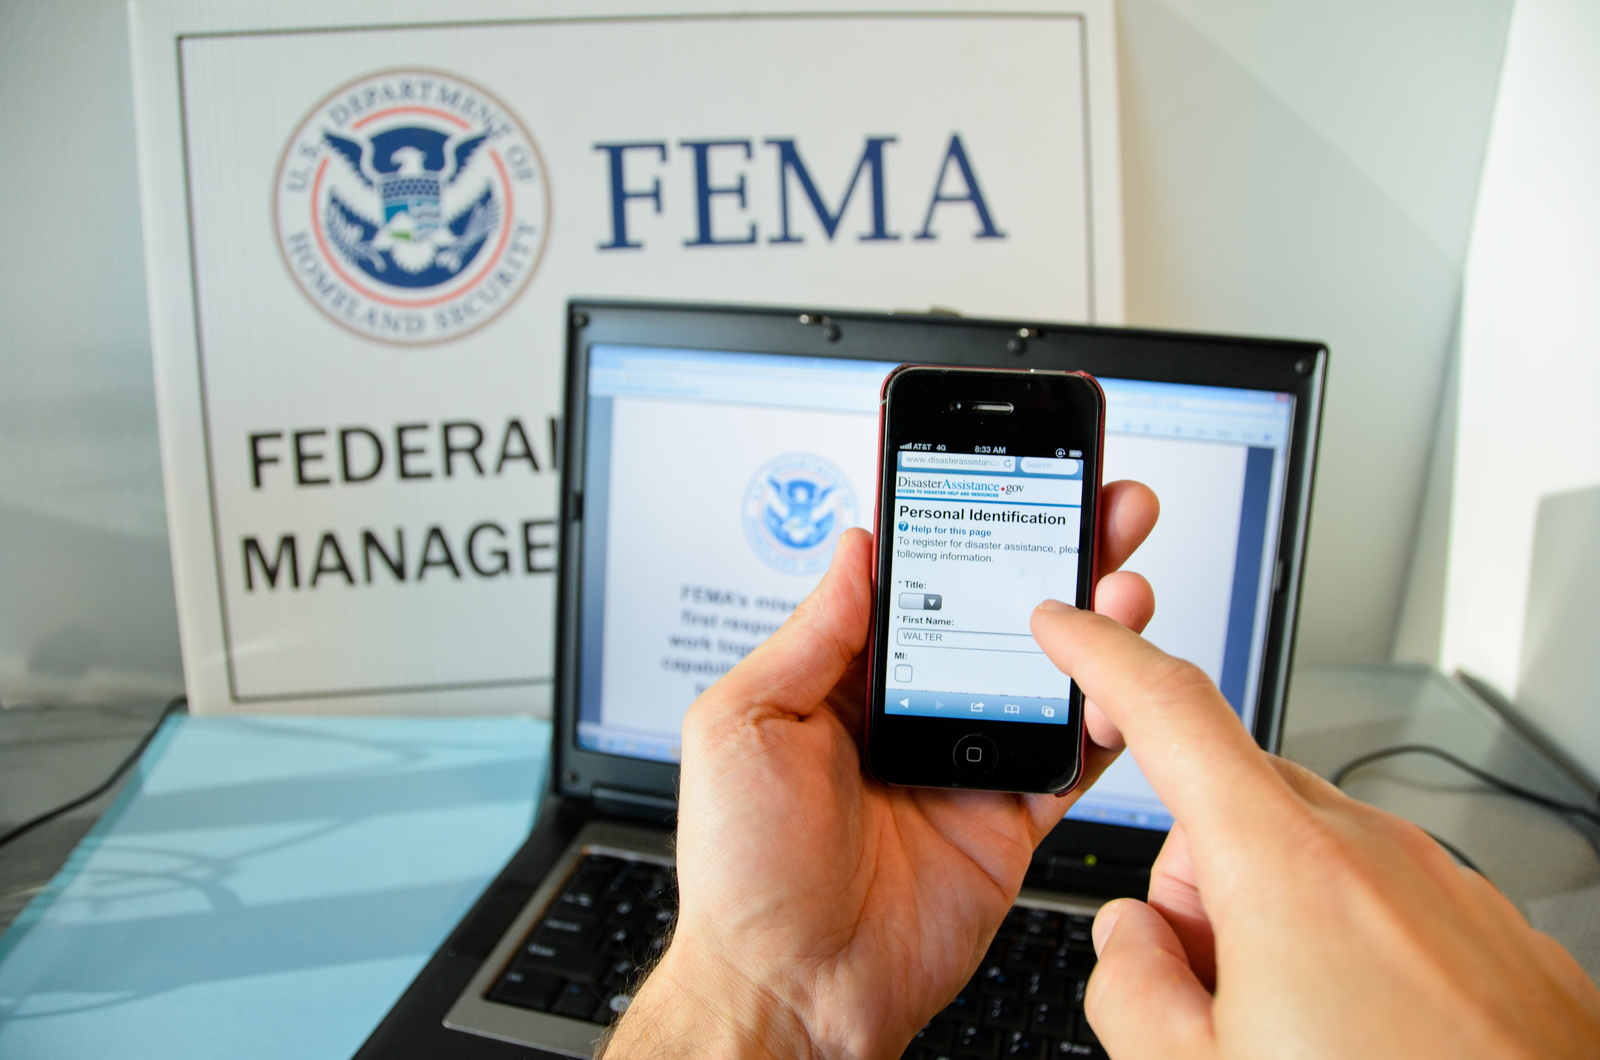 New York, N.Y., Jan. 23, 2013 -- A disaster survivor is registering for assistance on their Apple smartphone using disasterassistance.gov. Andre R. Aragon/FEMA